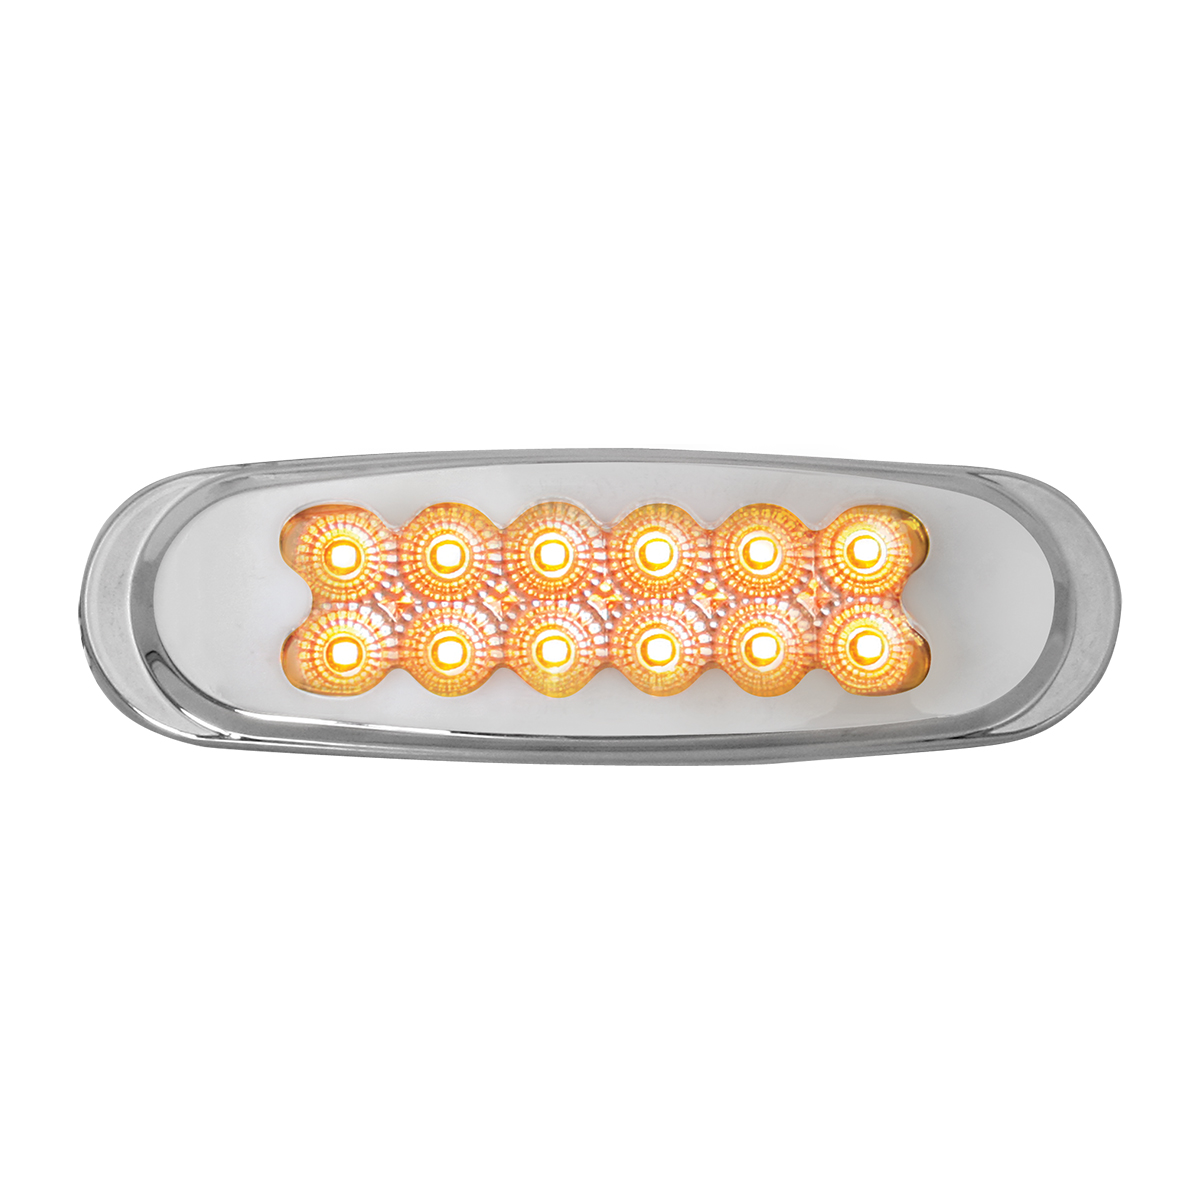 76701 Ultra Thin Spyder LED Marker Light w/ Chrome Plastic Matrix Bezel